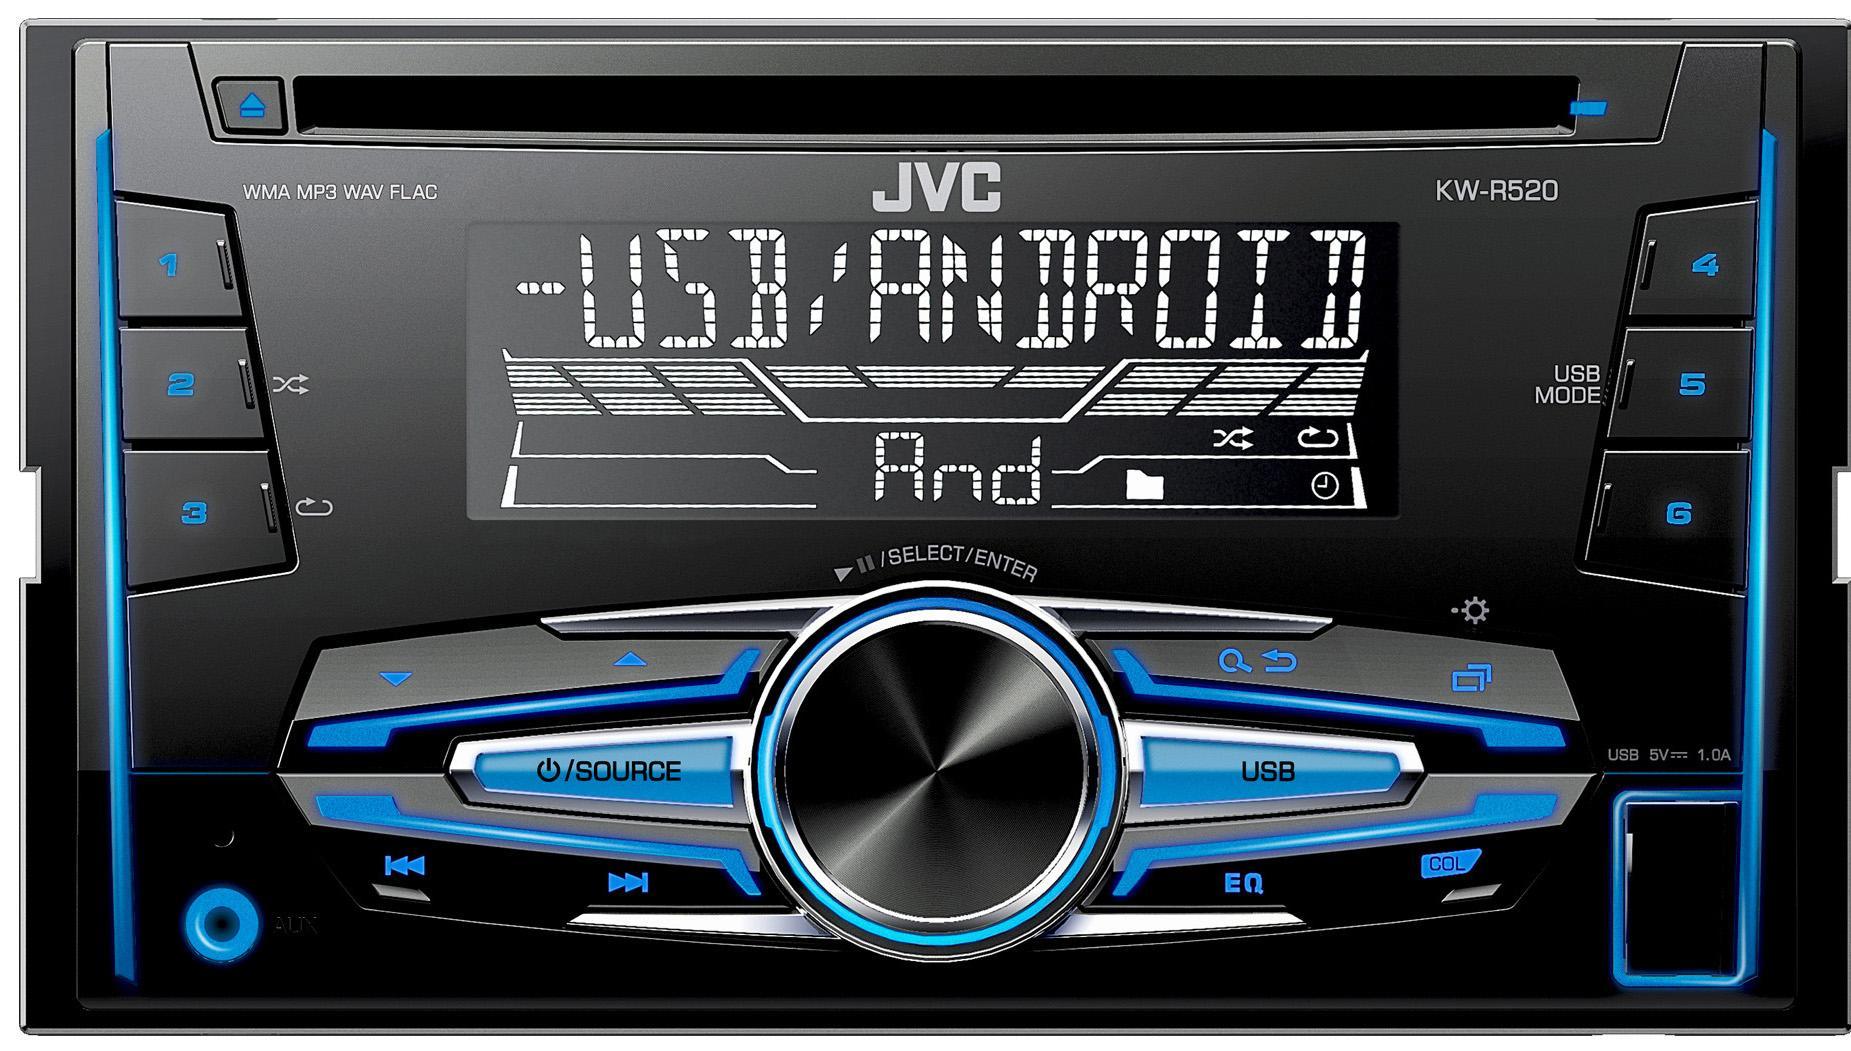 jvc kw r520 double din car stereo rh halfords com JVC Car Stereo CD Players JVC Car Stereo CD Players